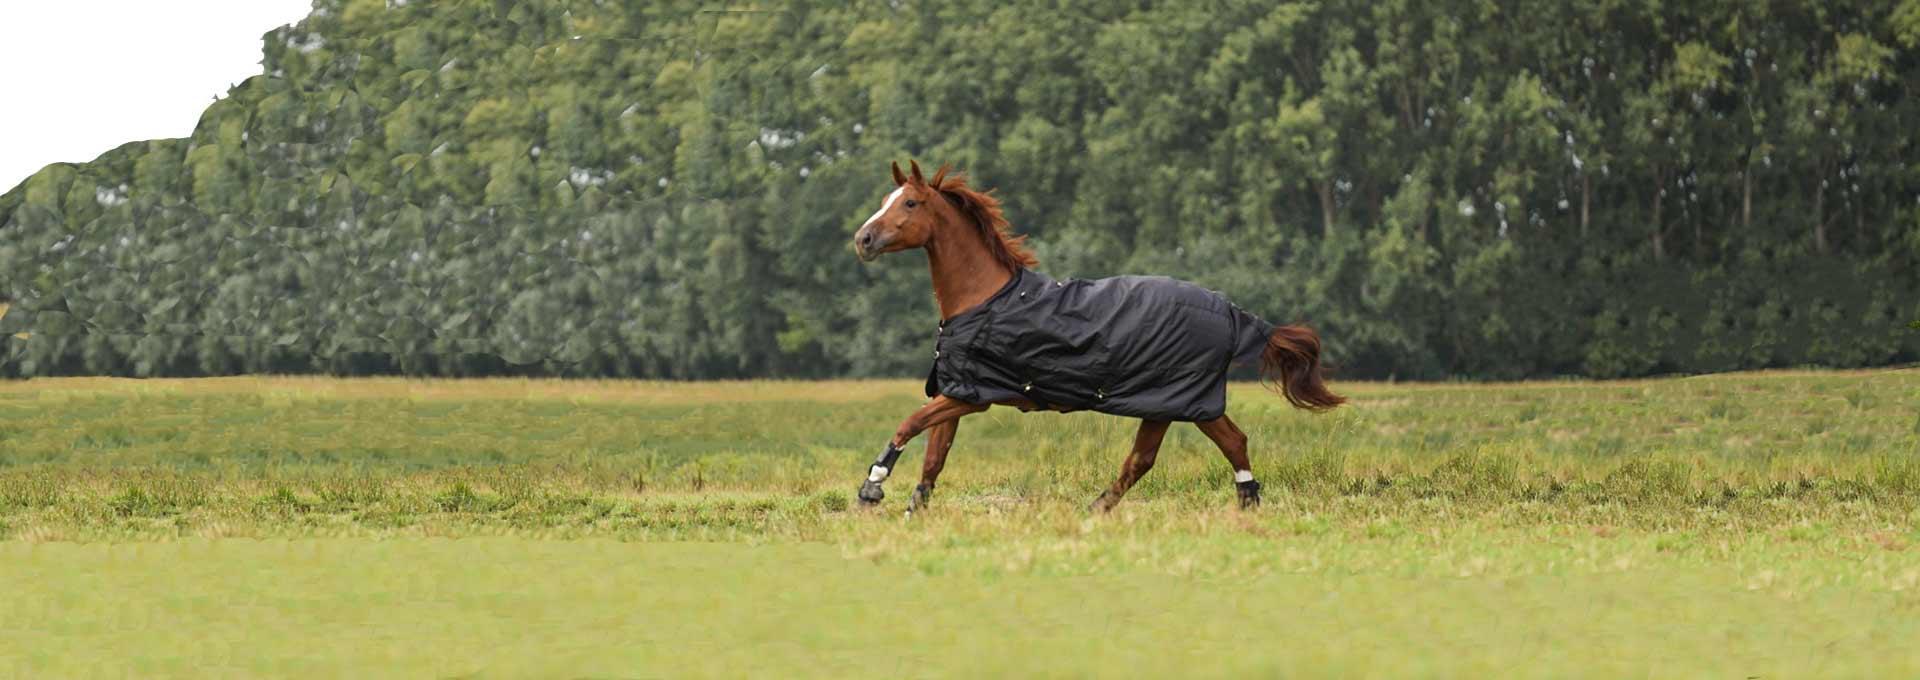 equitation decathlon couverture cheval poney nl